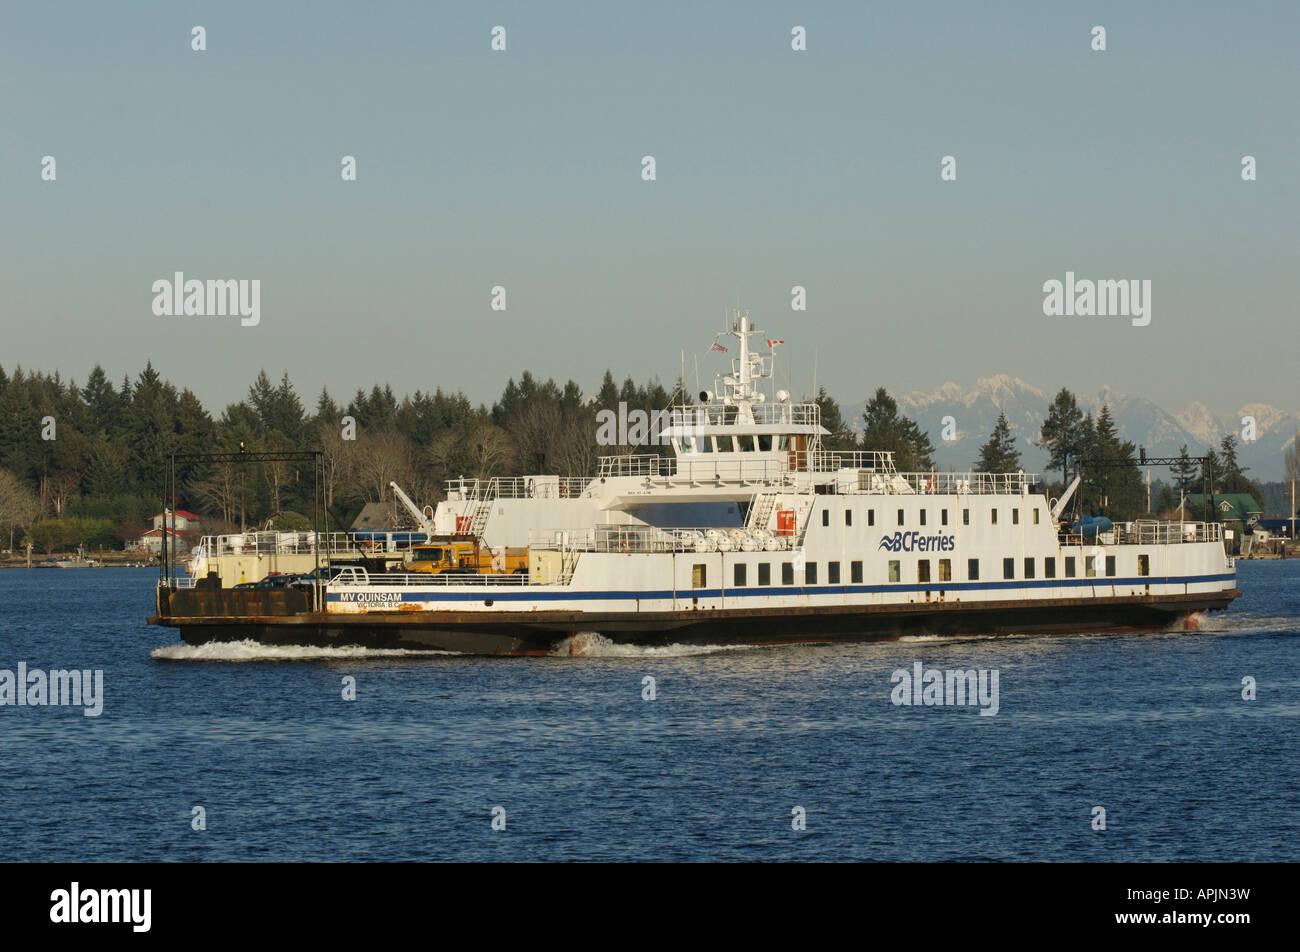 Ferry From Horseshoe Bay To Gabriola Island